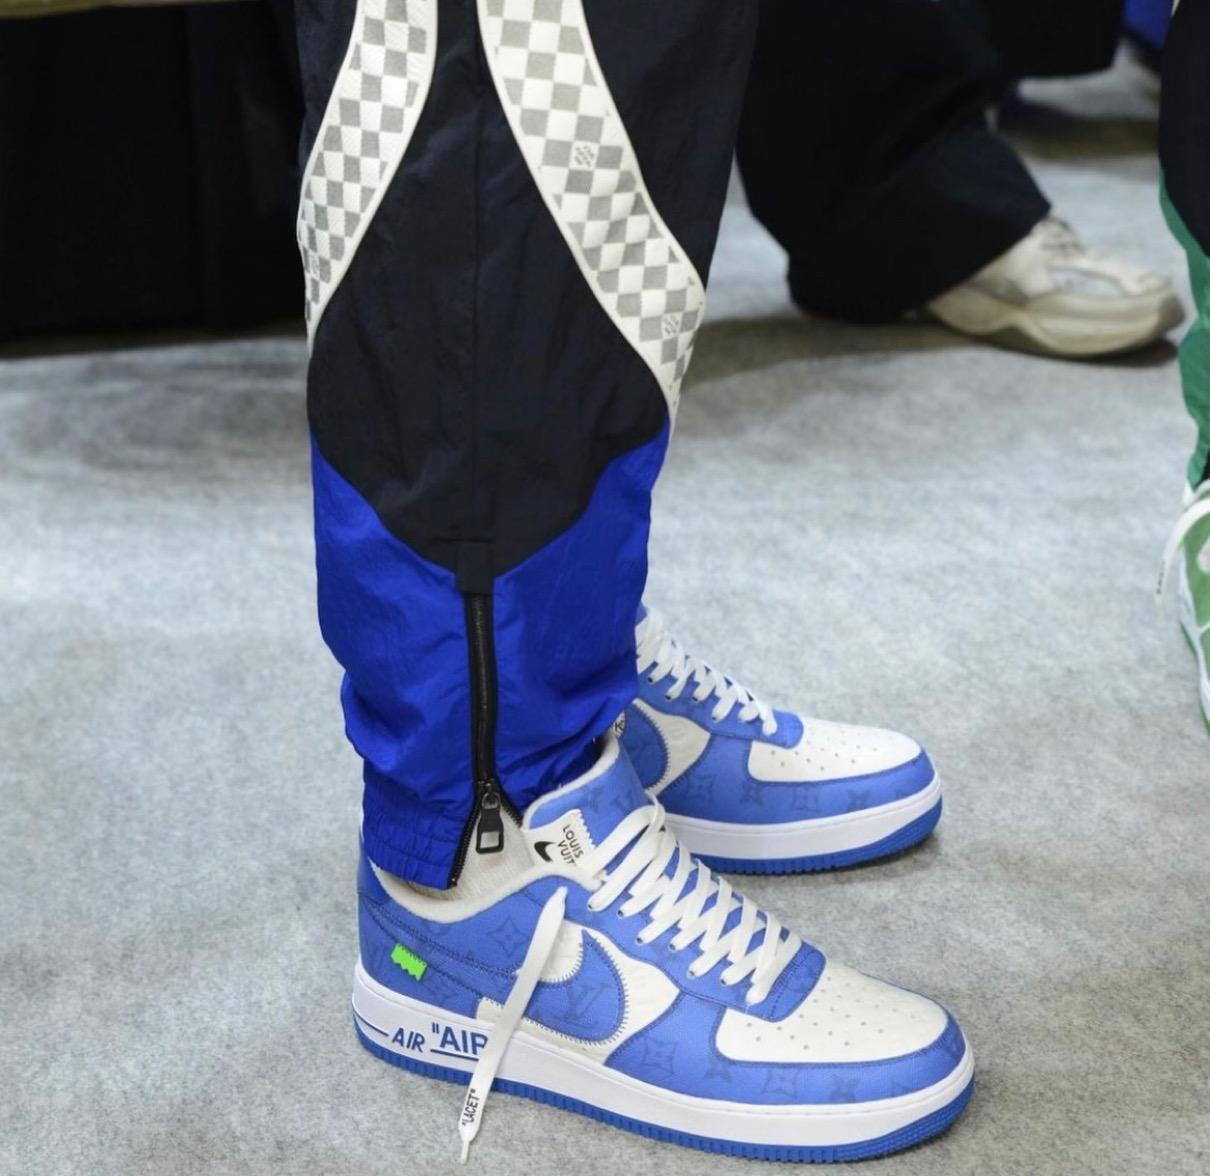 LV,Virgil,Nike,Air Force 1 Low  黑武士装扮!LV x Nike AF1 最新实物曝光!发售传闻有了!